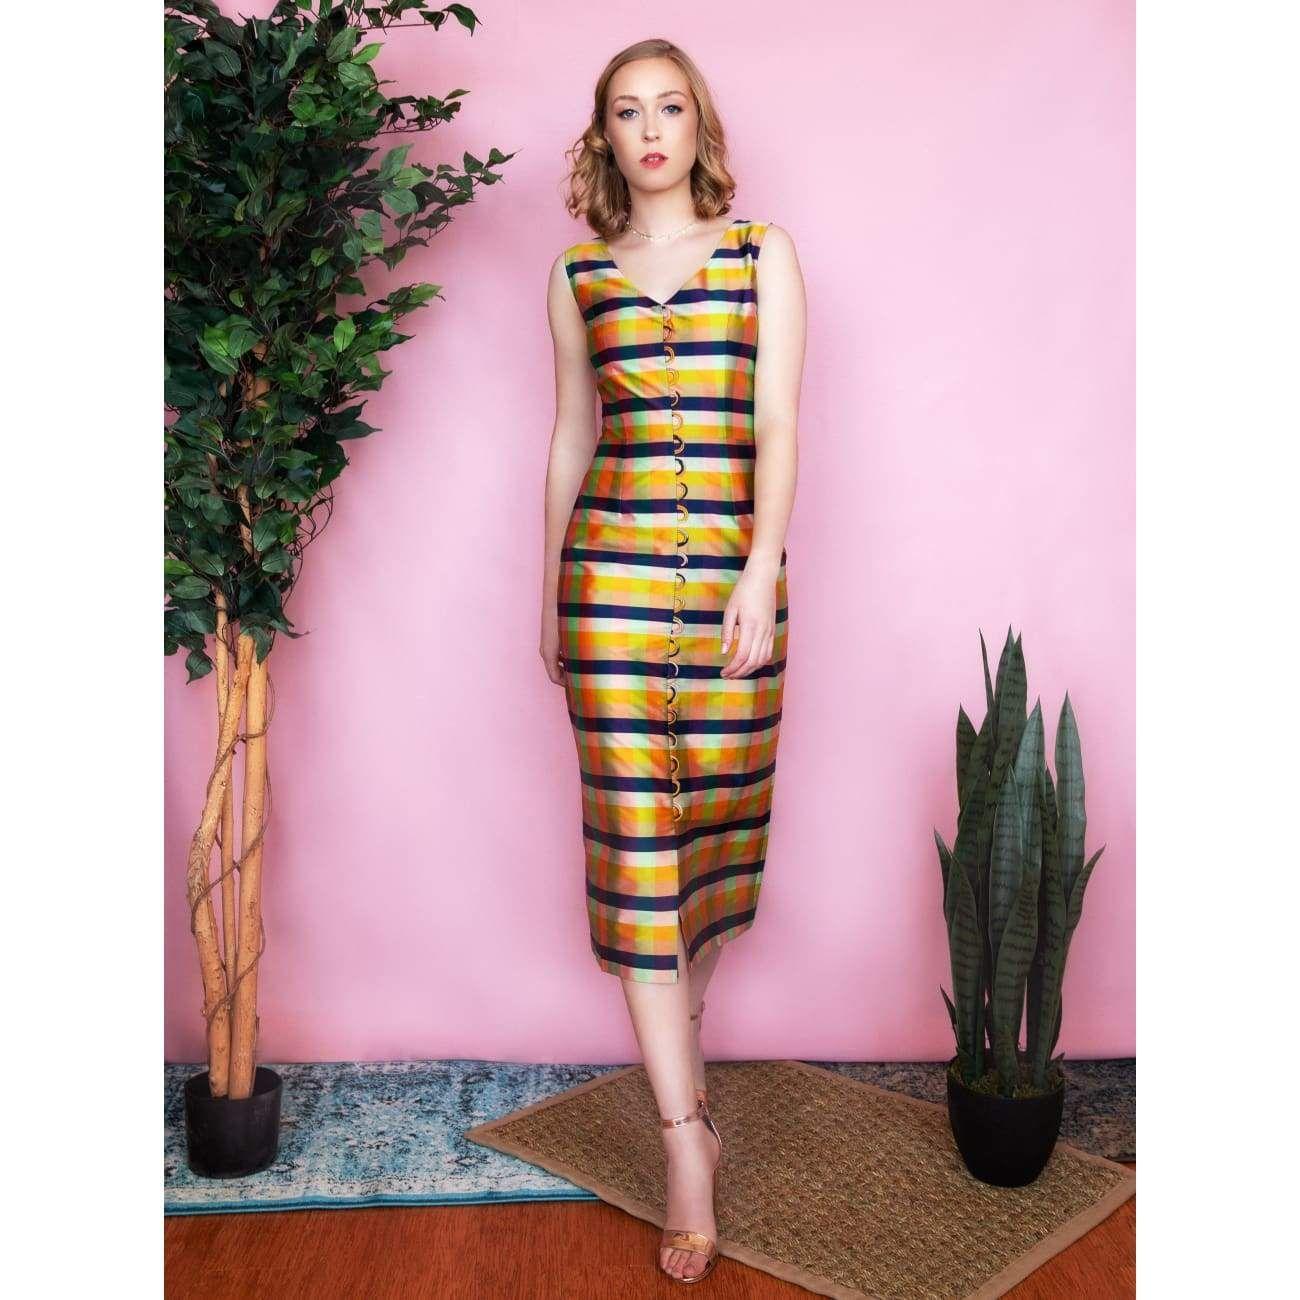 Olivia Rose Gold Midi Dress - Medium (Sizes 6-8)